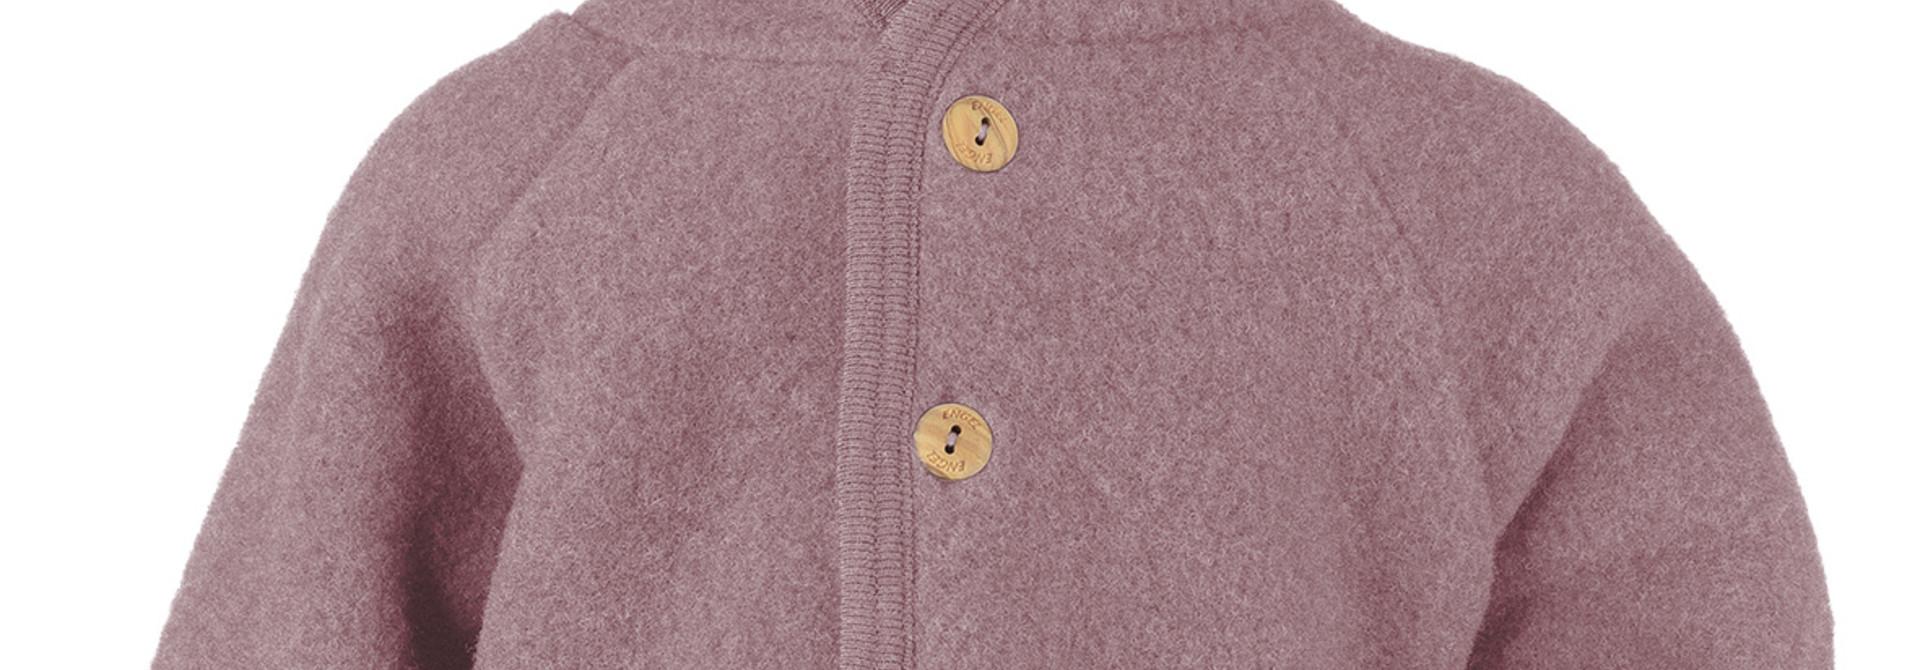 Hooded vest - Rosewood